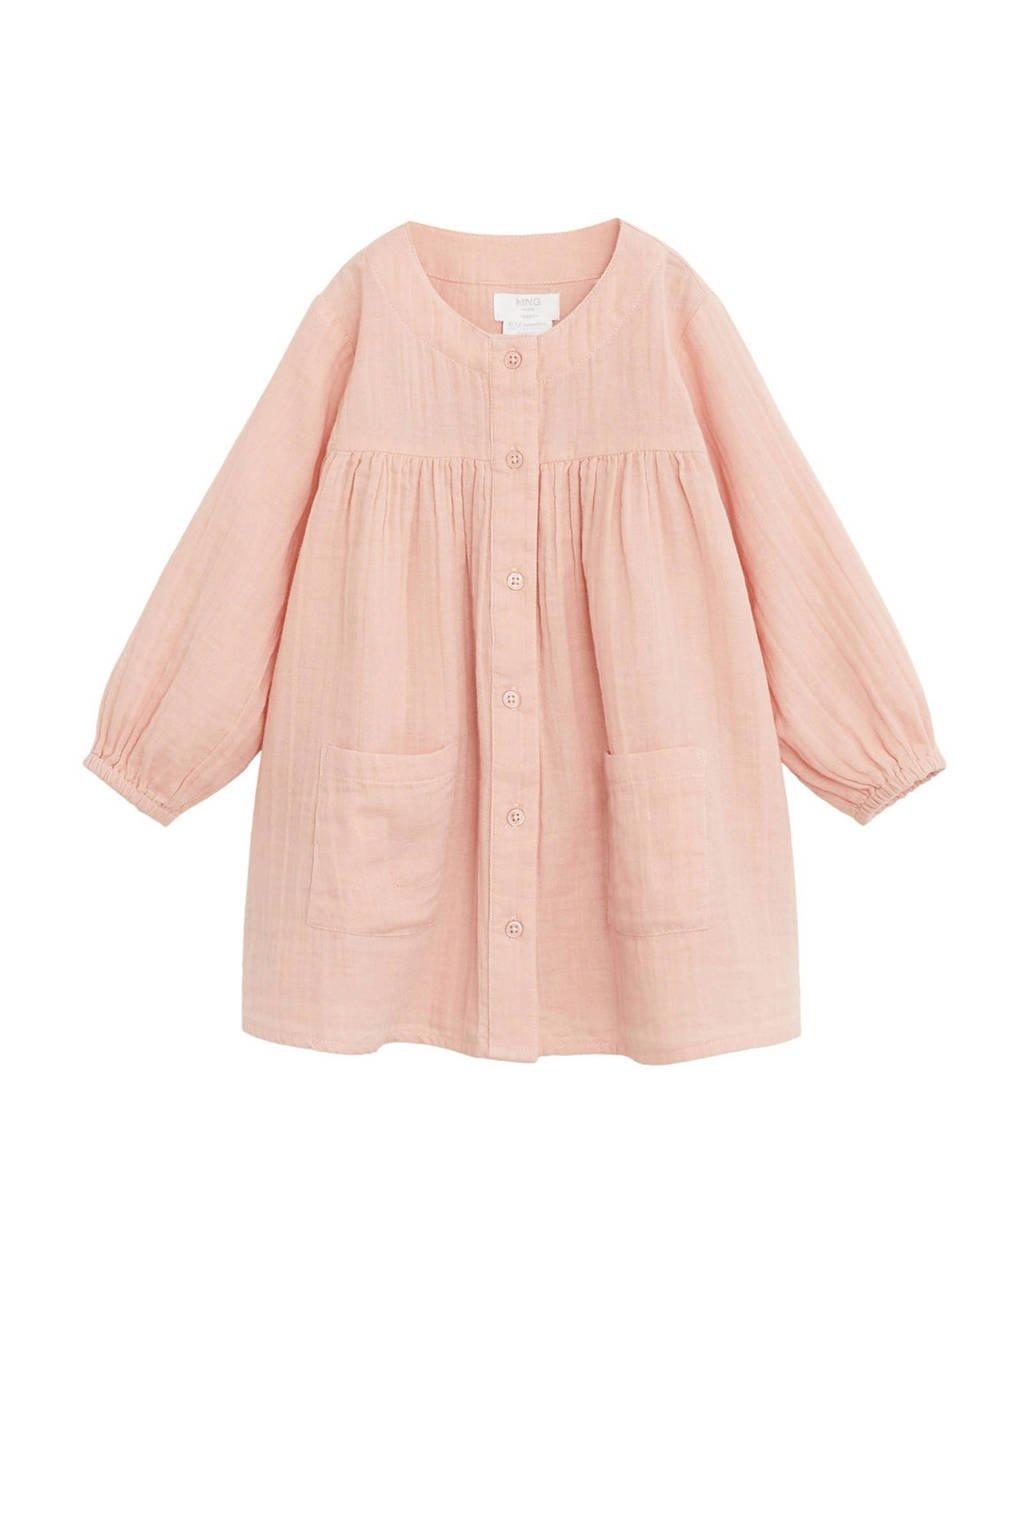 Mango Kids blousejurk met textuur roze, Roze